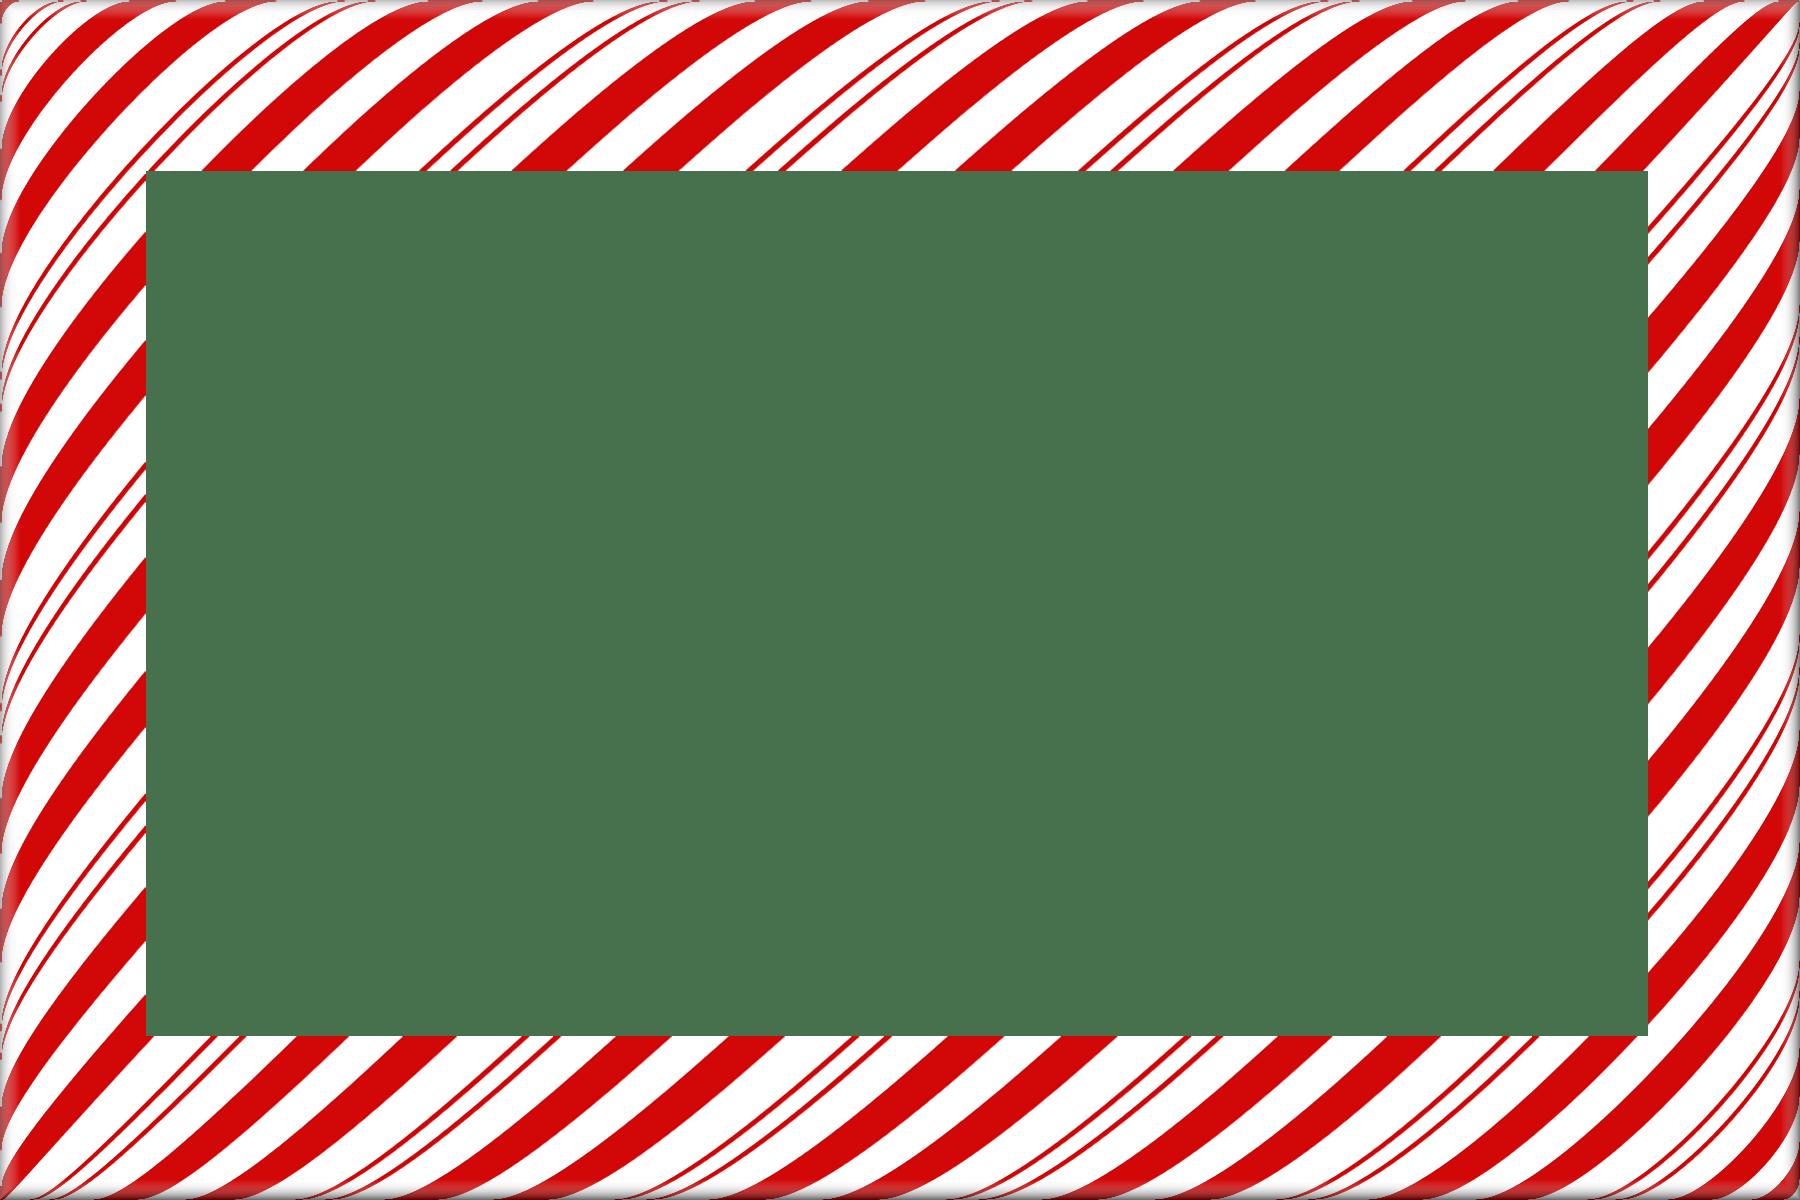 Candy Cane Christmas Borders and Frames digital frames